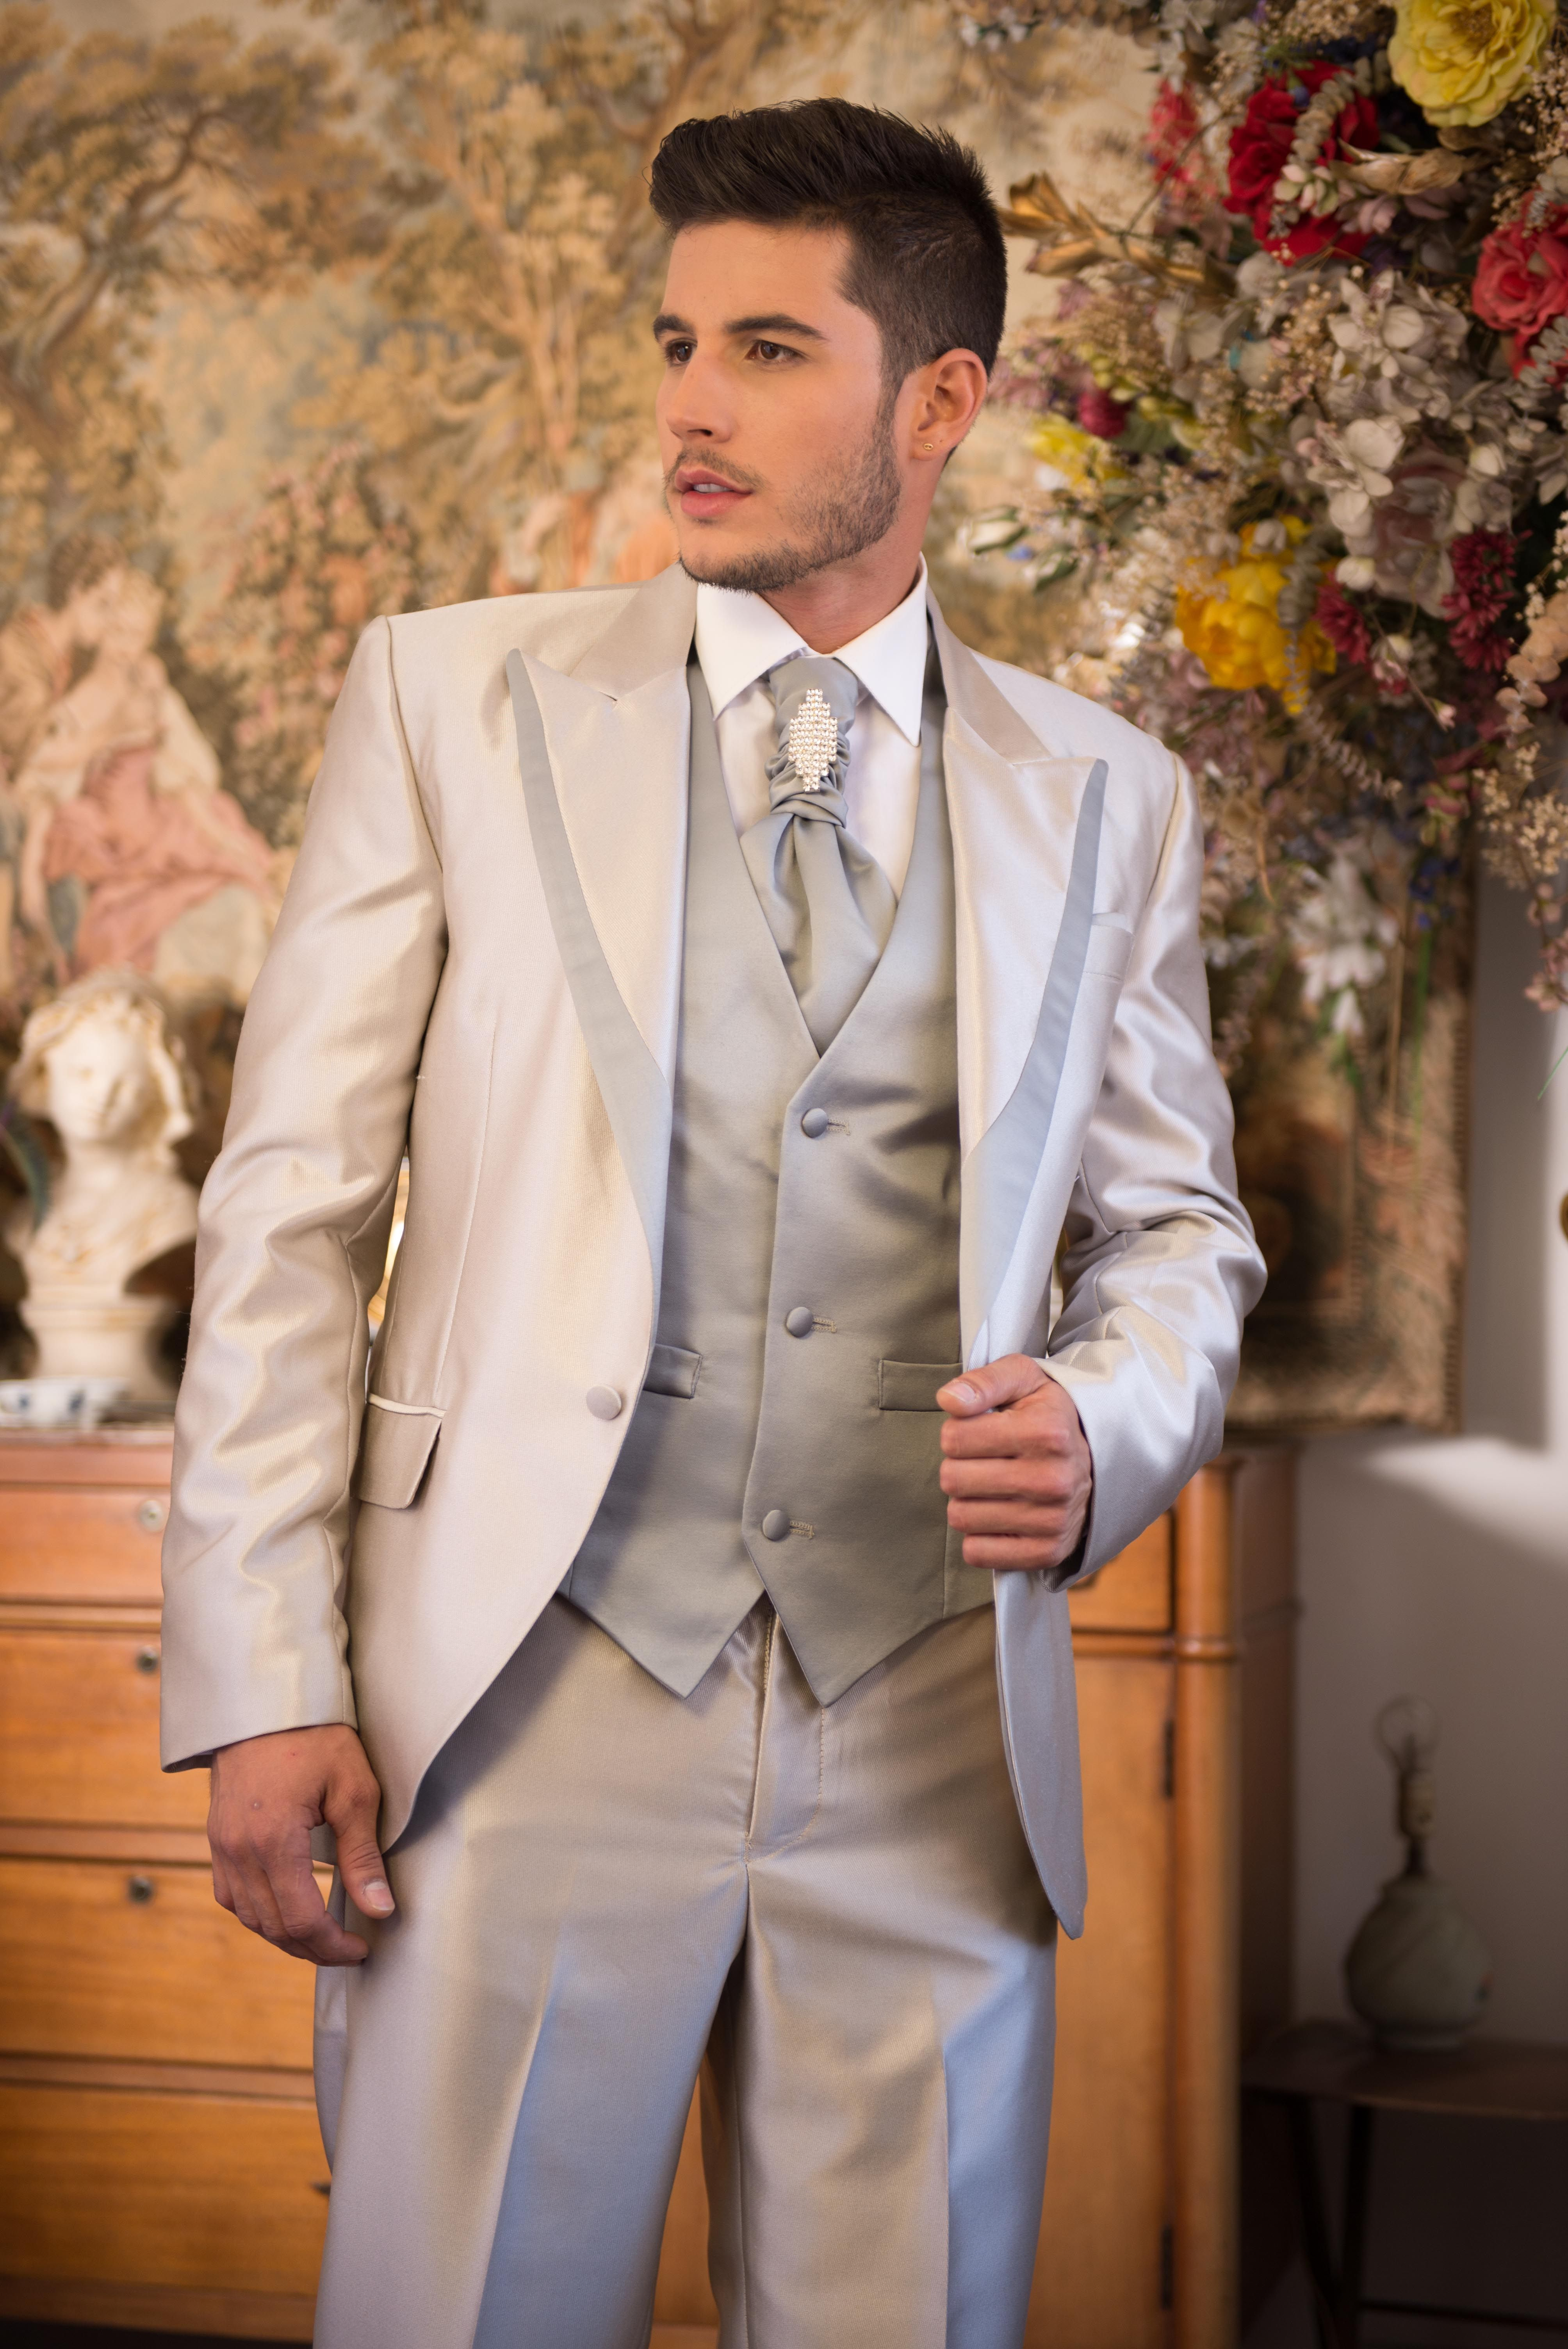 4b1f45e07e4 Traje de novio perla | Trajes para boda de hombre en 2019 | Traje ...